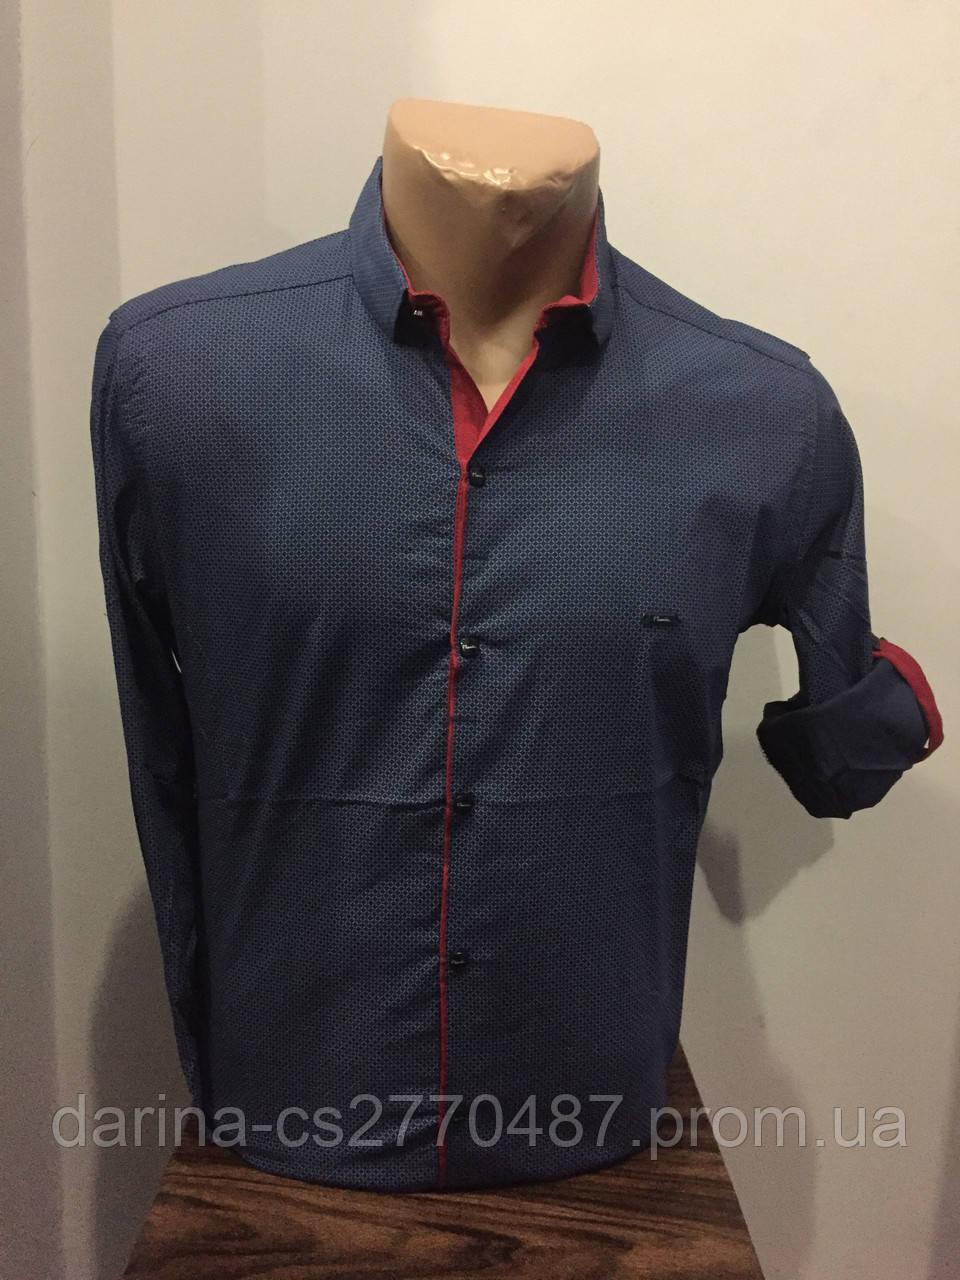 Рубашка мужская на кнопках S,XL